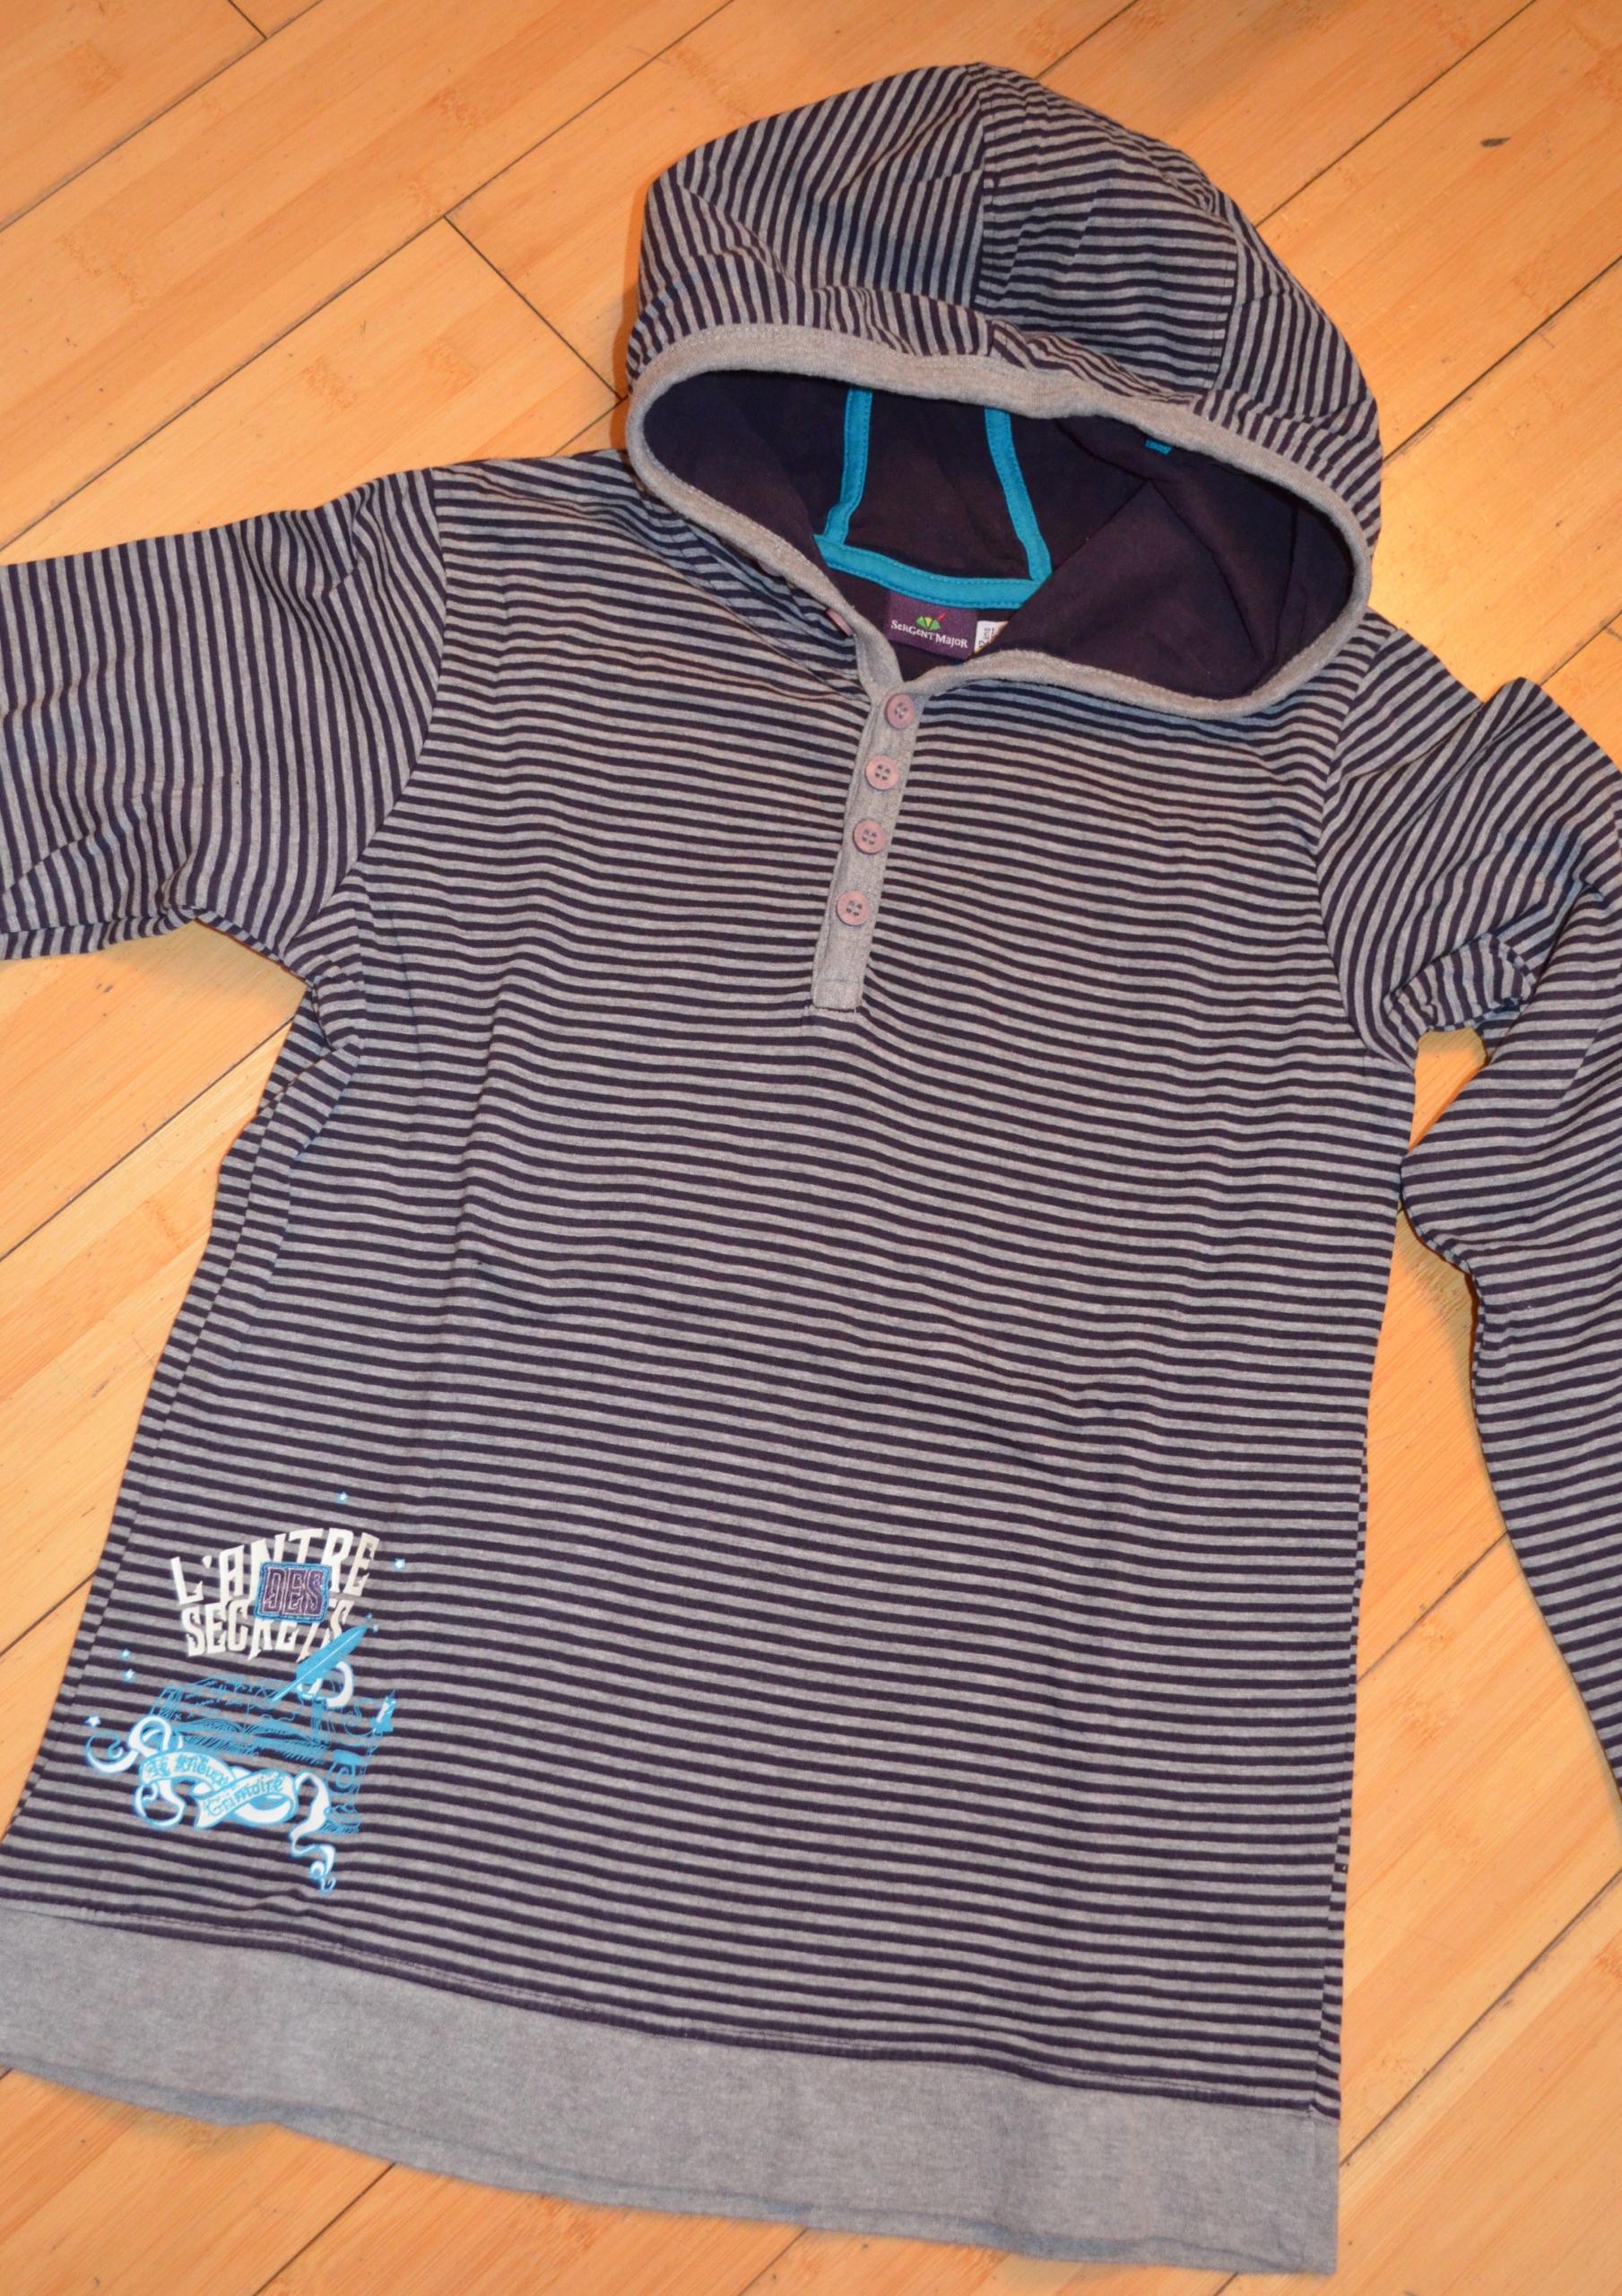 Bluza MAJOR FRANCE - rozmiar 148/ 11-12 lat